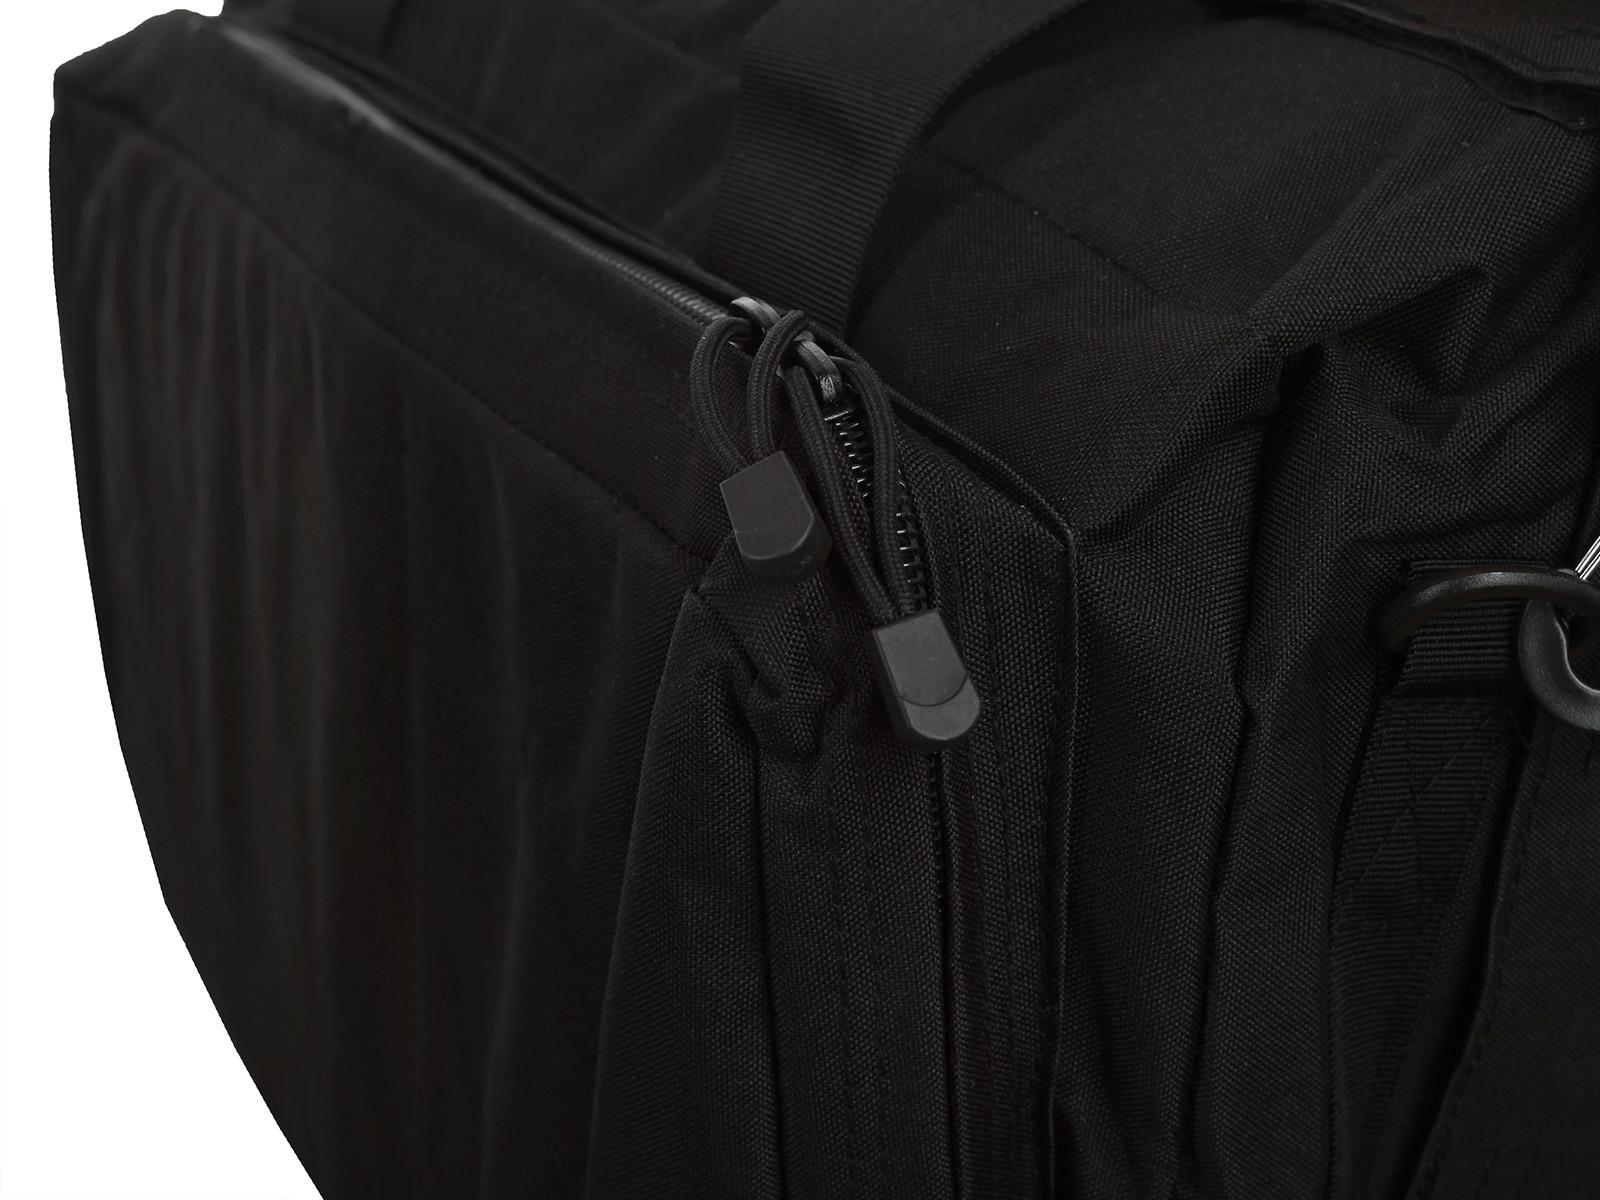 Тактическая надежная сумка-баул Русская Охота - заказать онлайн